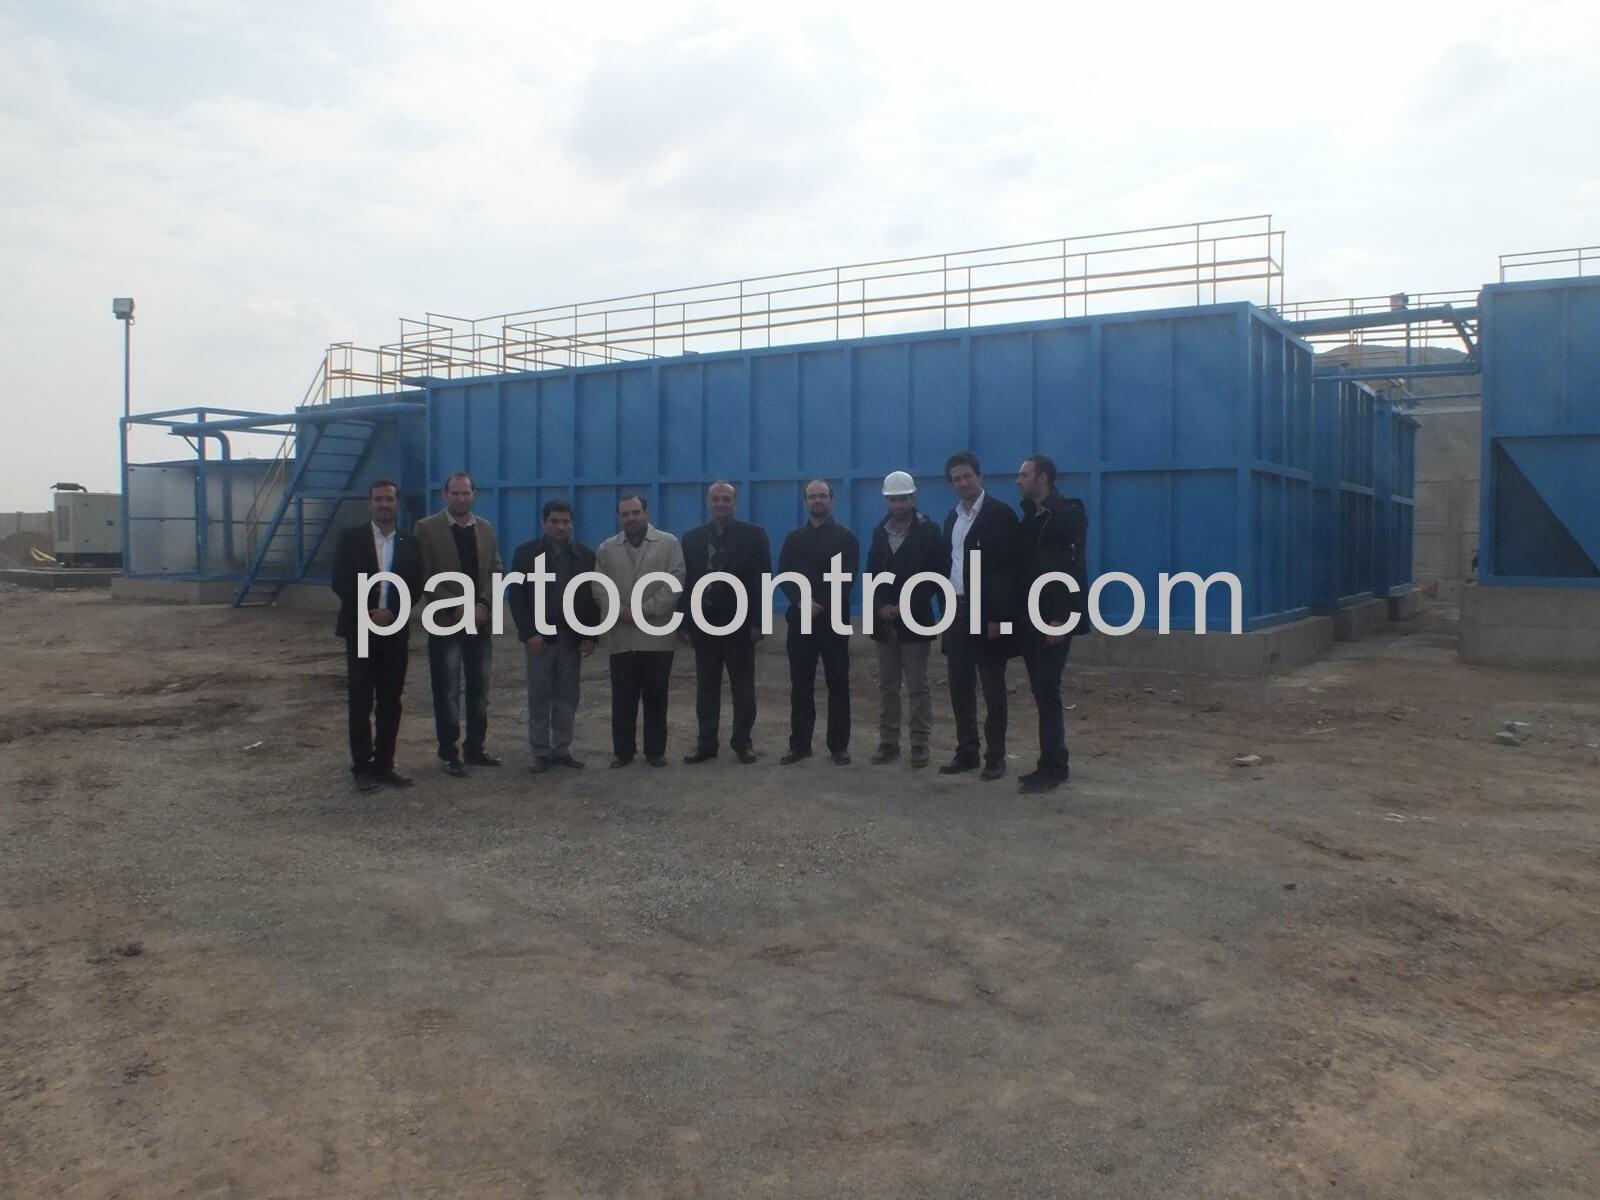 Urban Wastewater Treatment Packageپکیج تصفیه فاضلاب شهری آب و فاضلاب صفادشت2 - پروژه تصفیه فاضلاب شهری